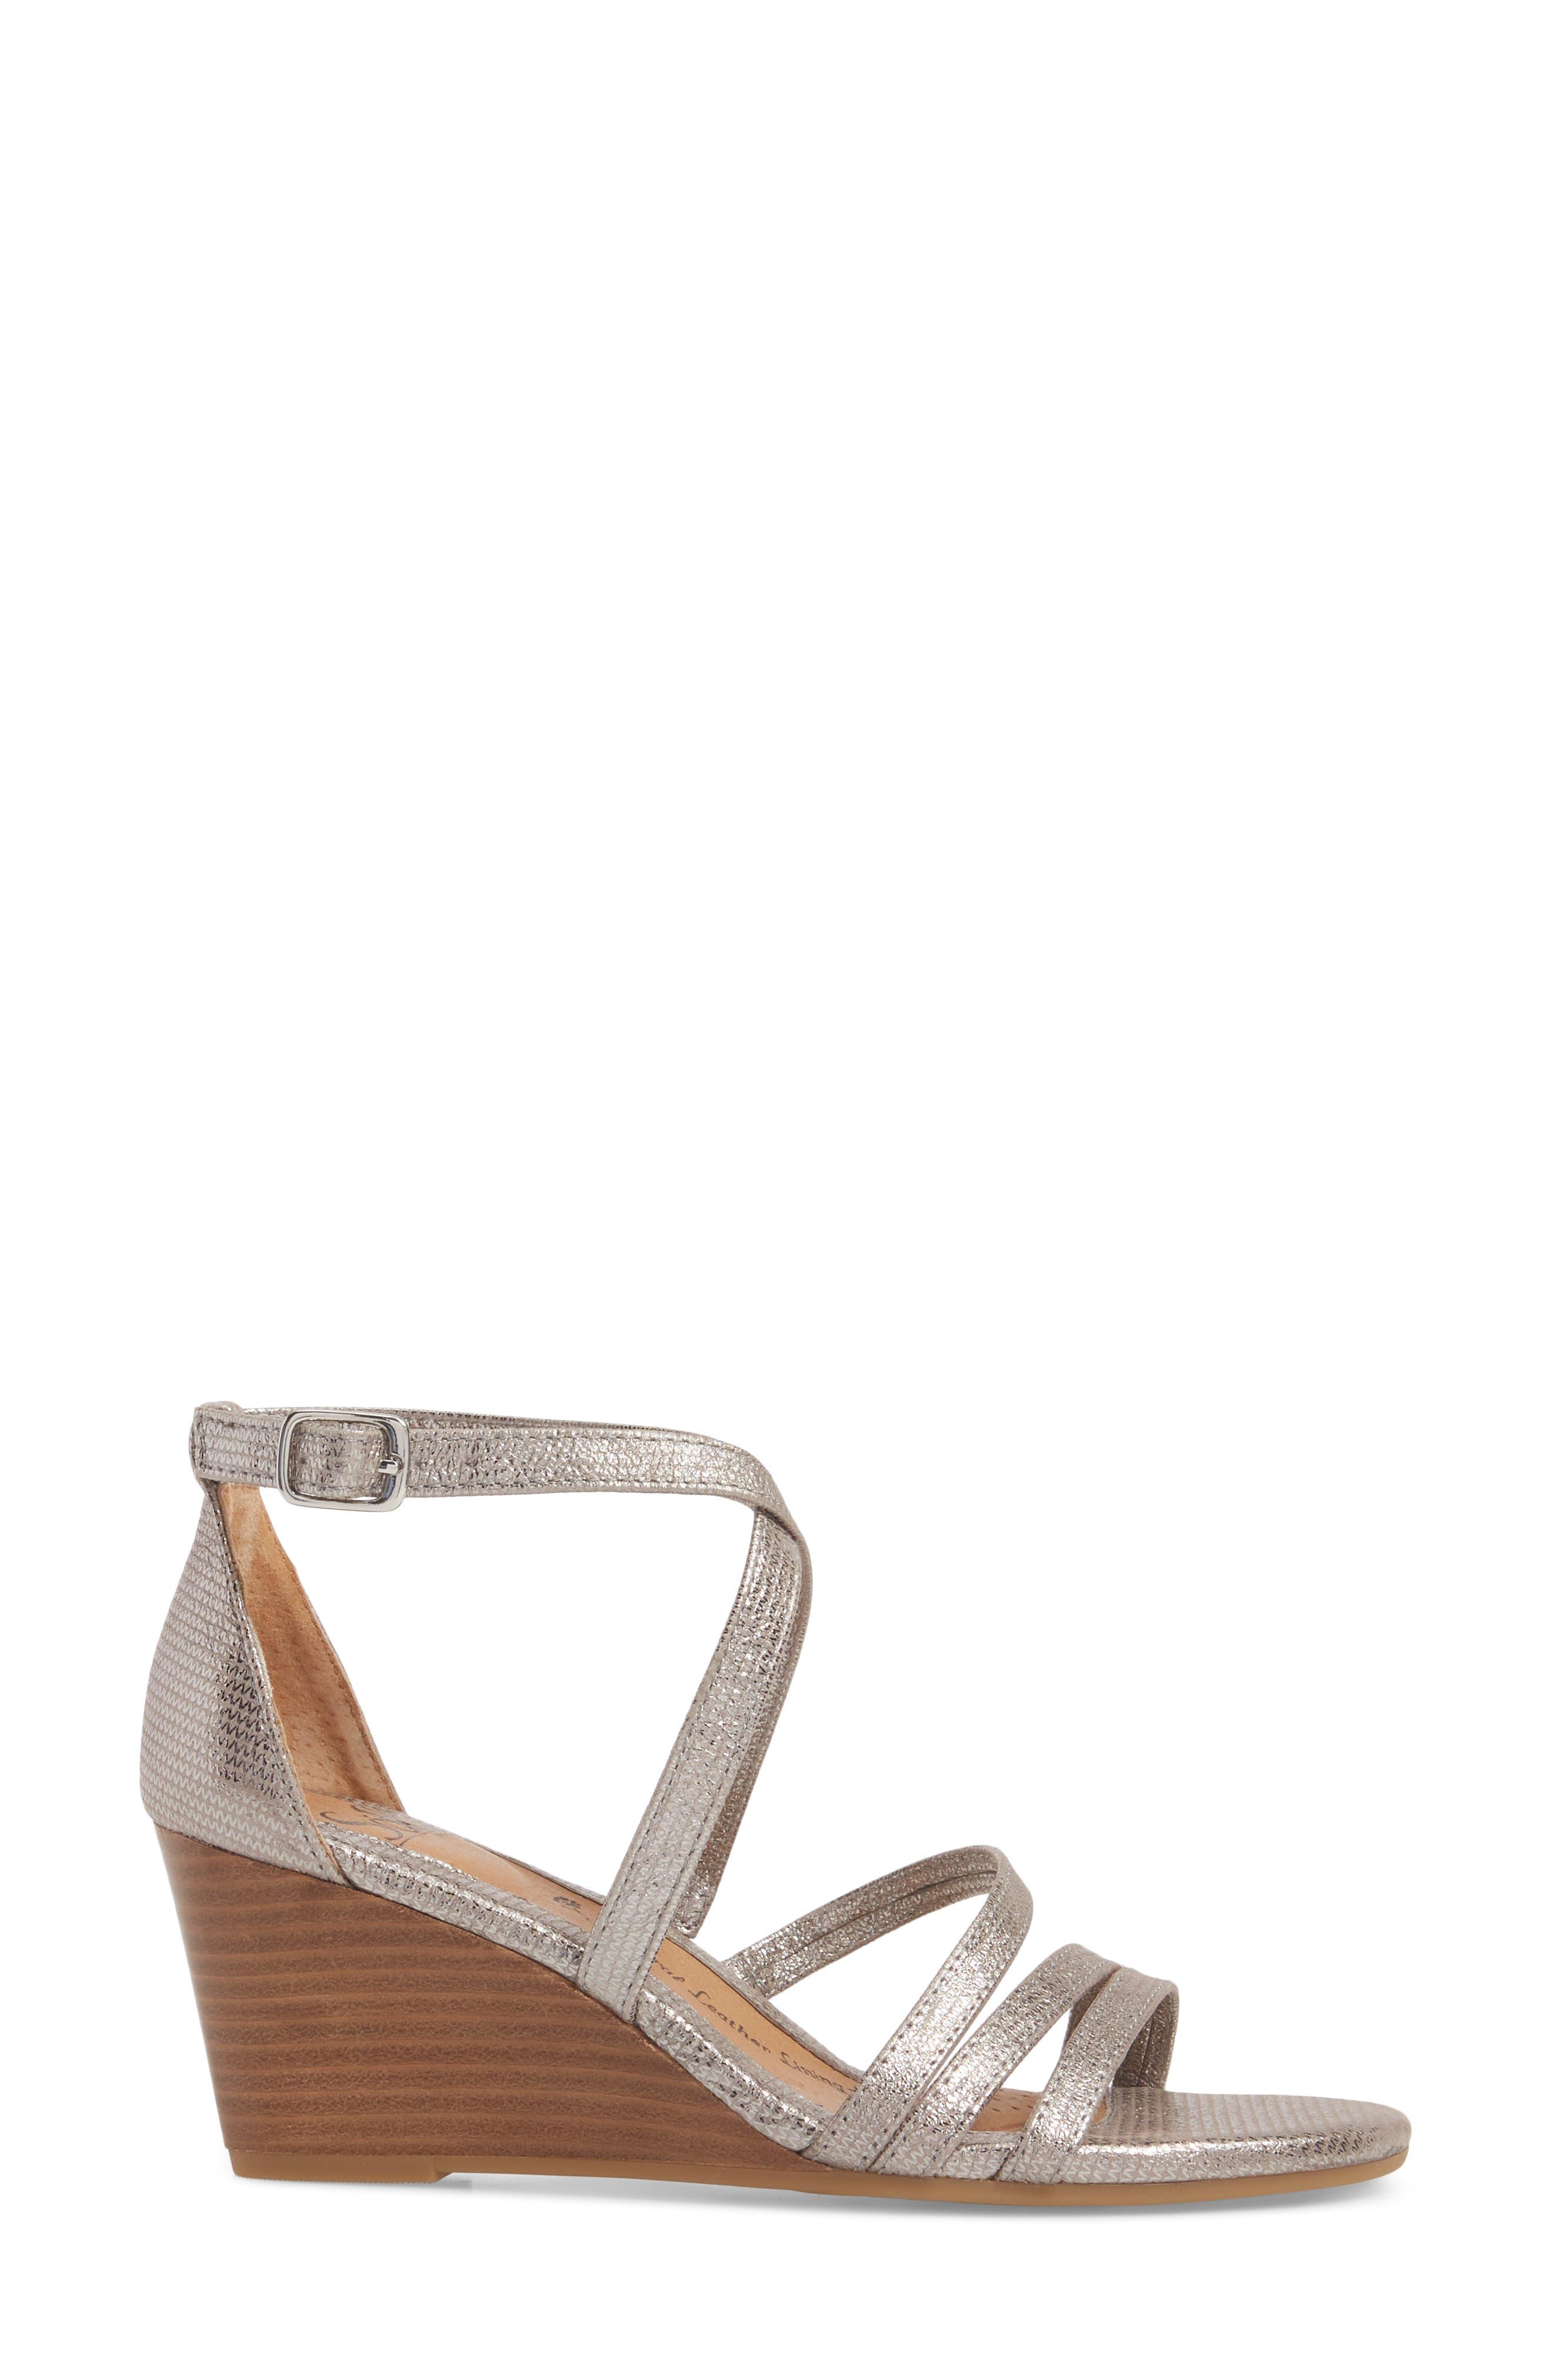 Mecina Wedge Sandal,                             Alternate thumbnail 3, color,                             Silver Metallic Leather